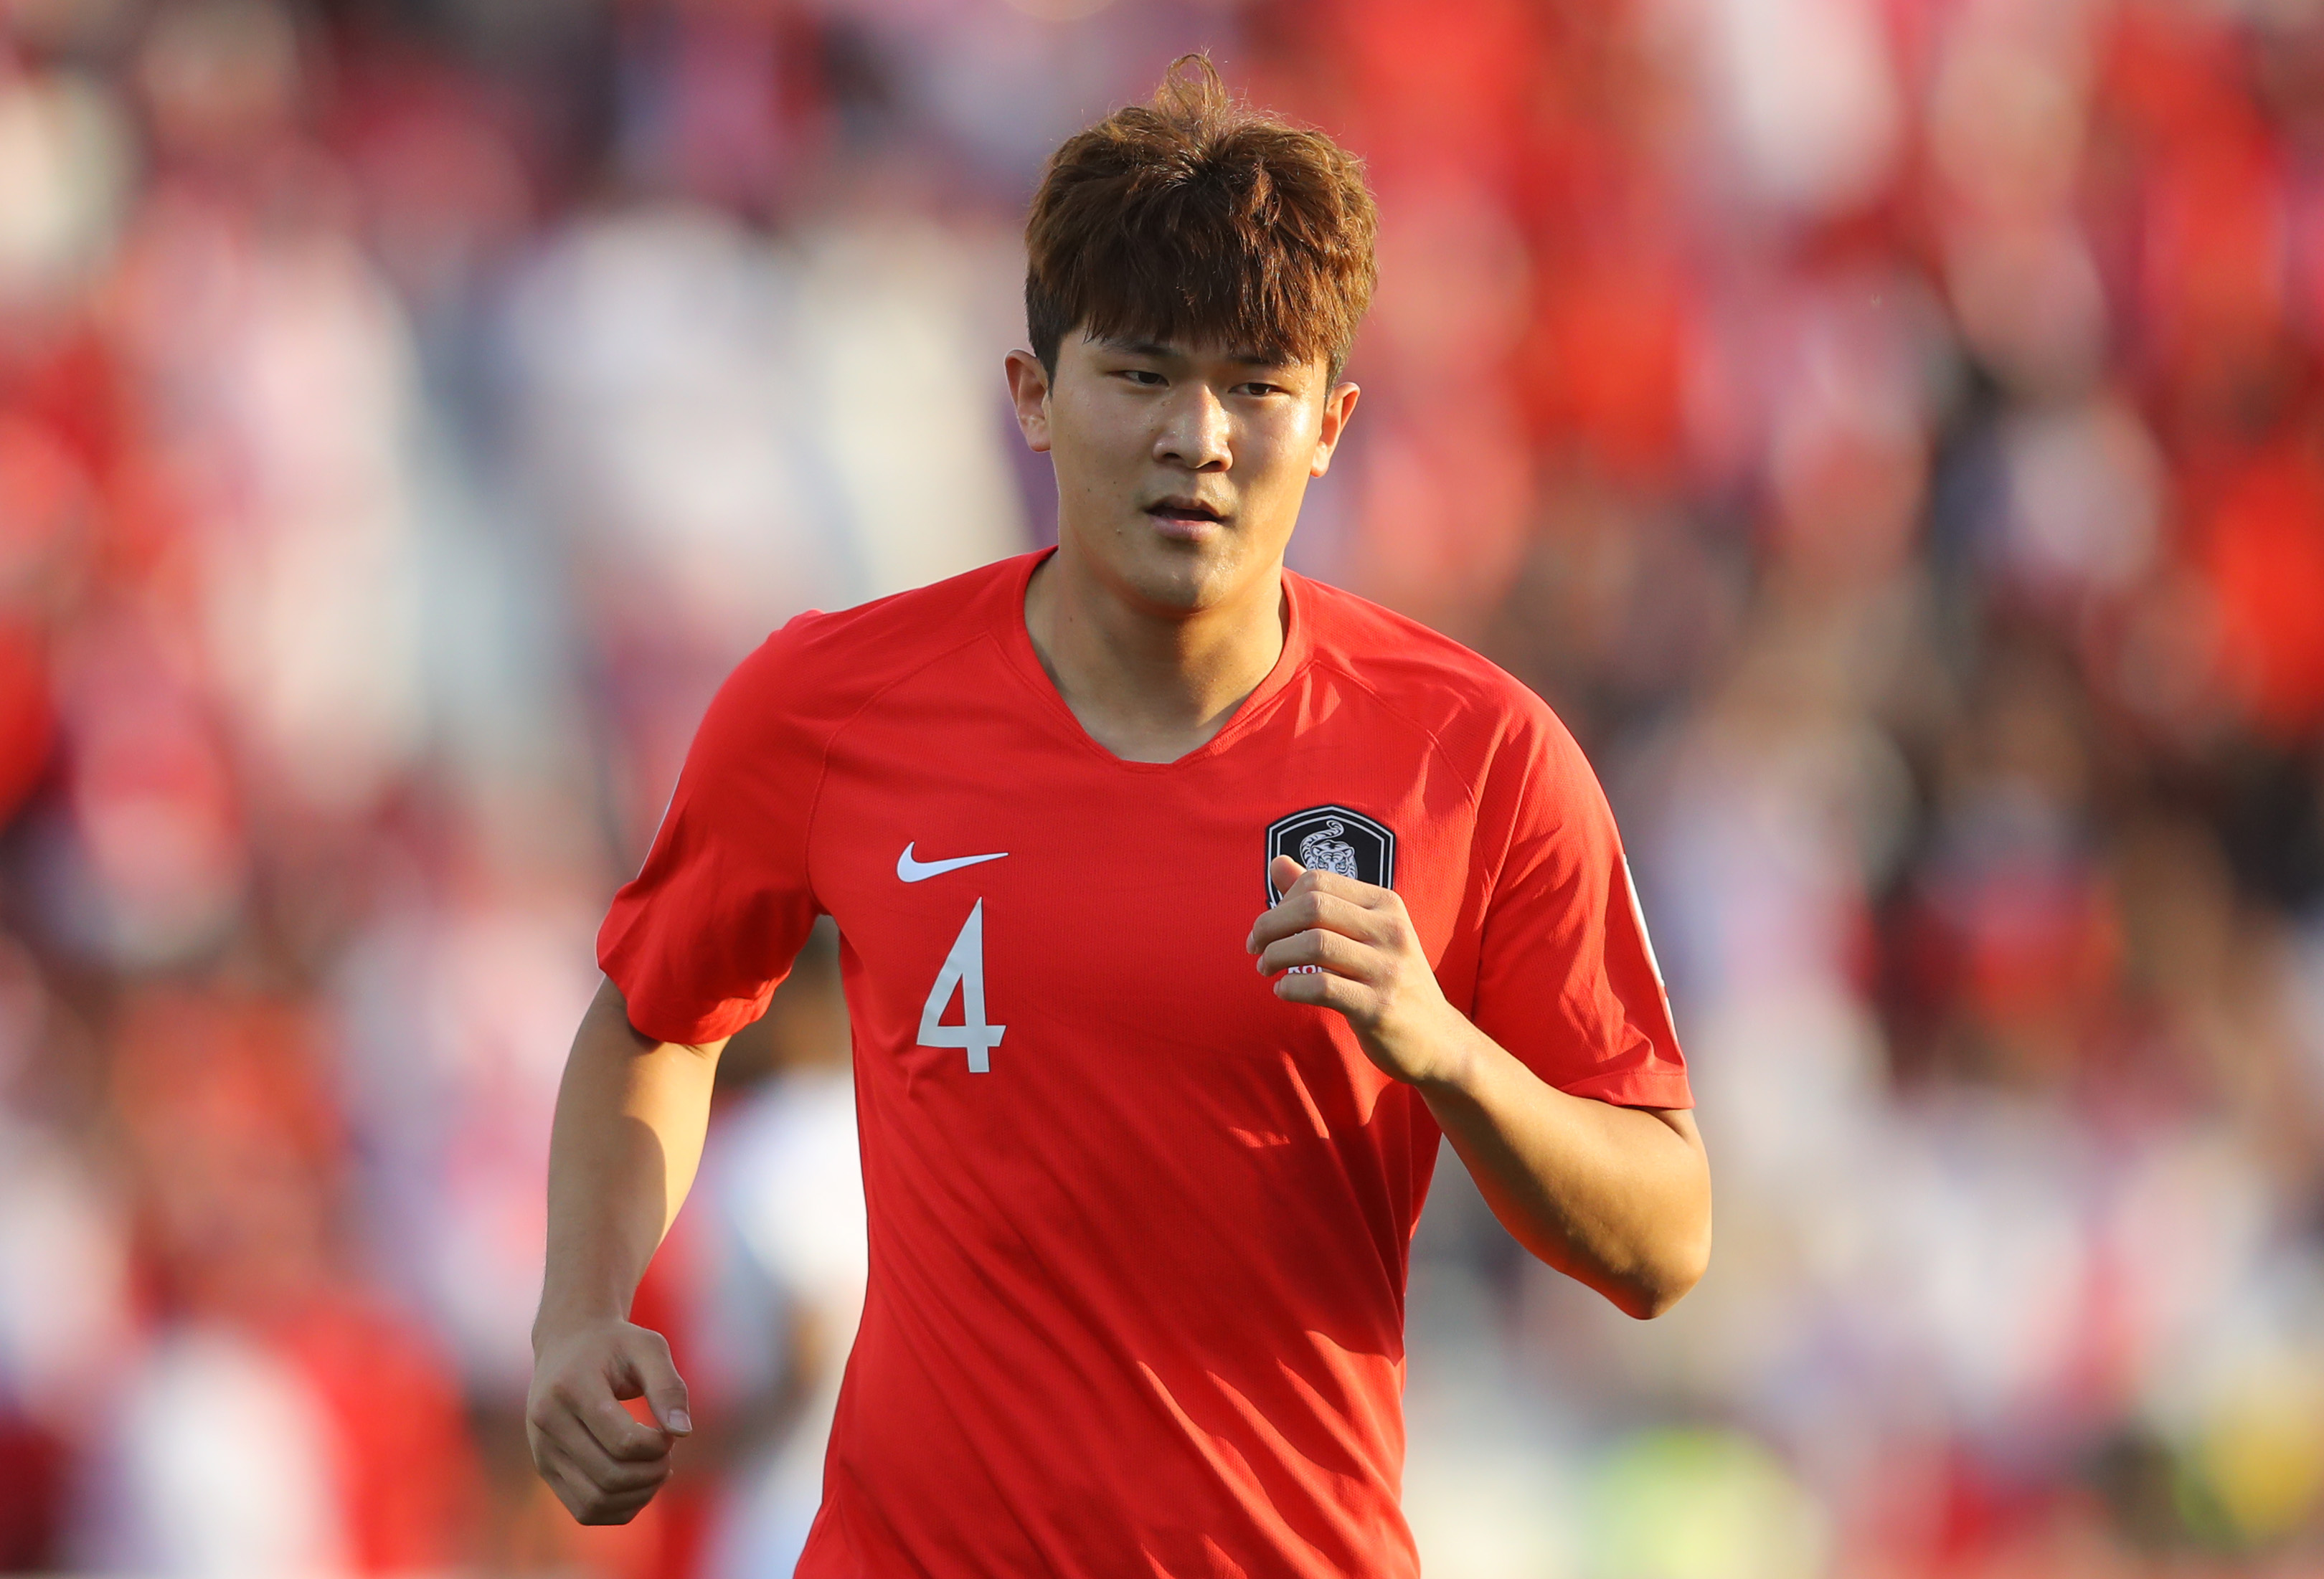 Tottenham Hotspur are preparing a move for Kim Min-jae - A good option?